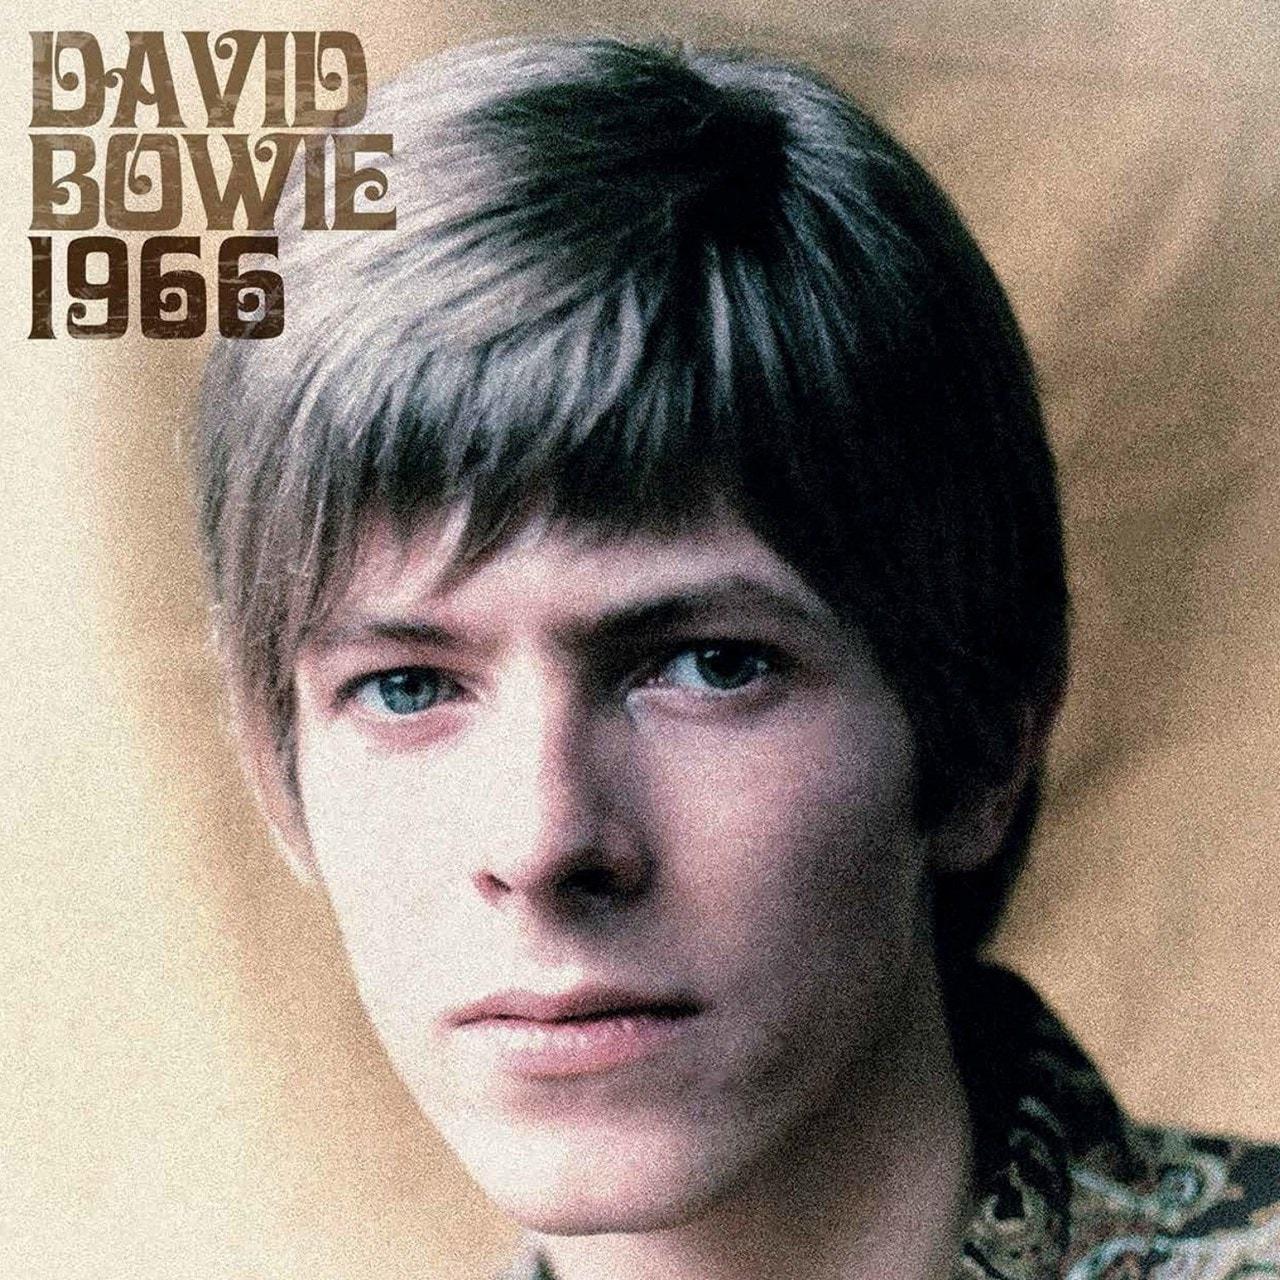 1966 - 1